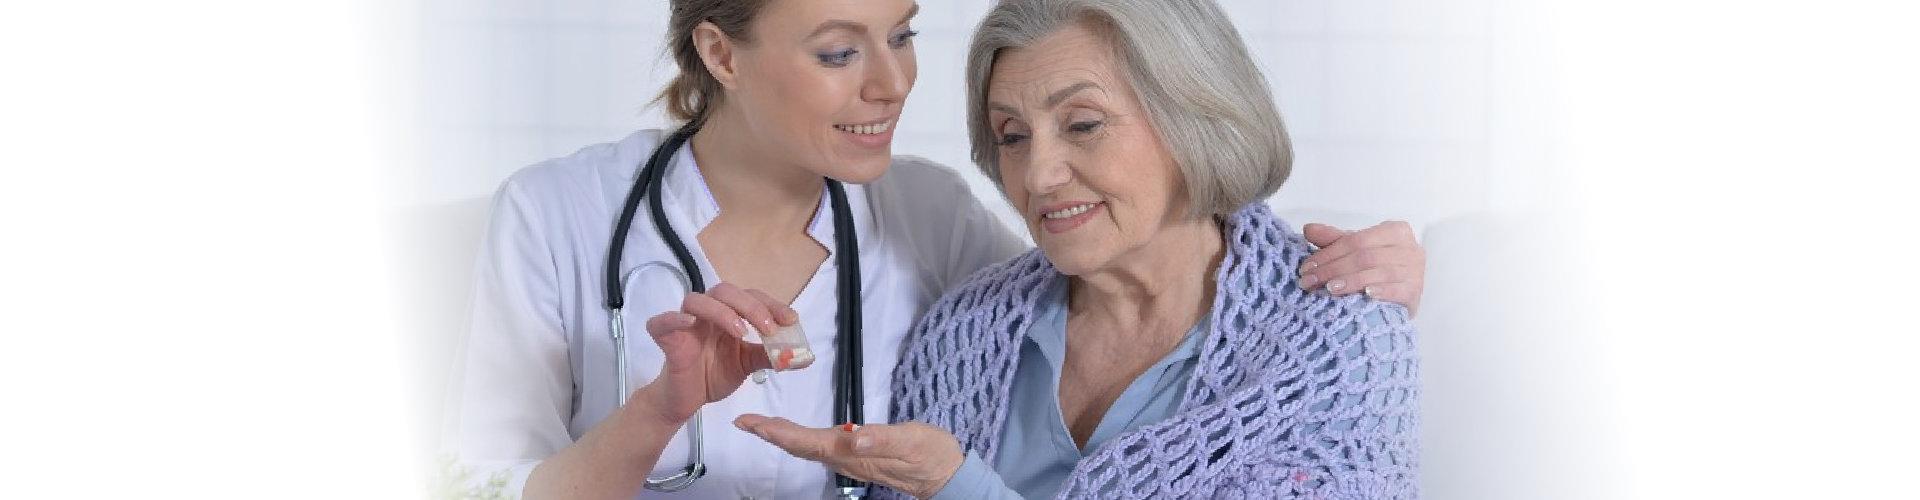 nurse giving medicine to senior woman